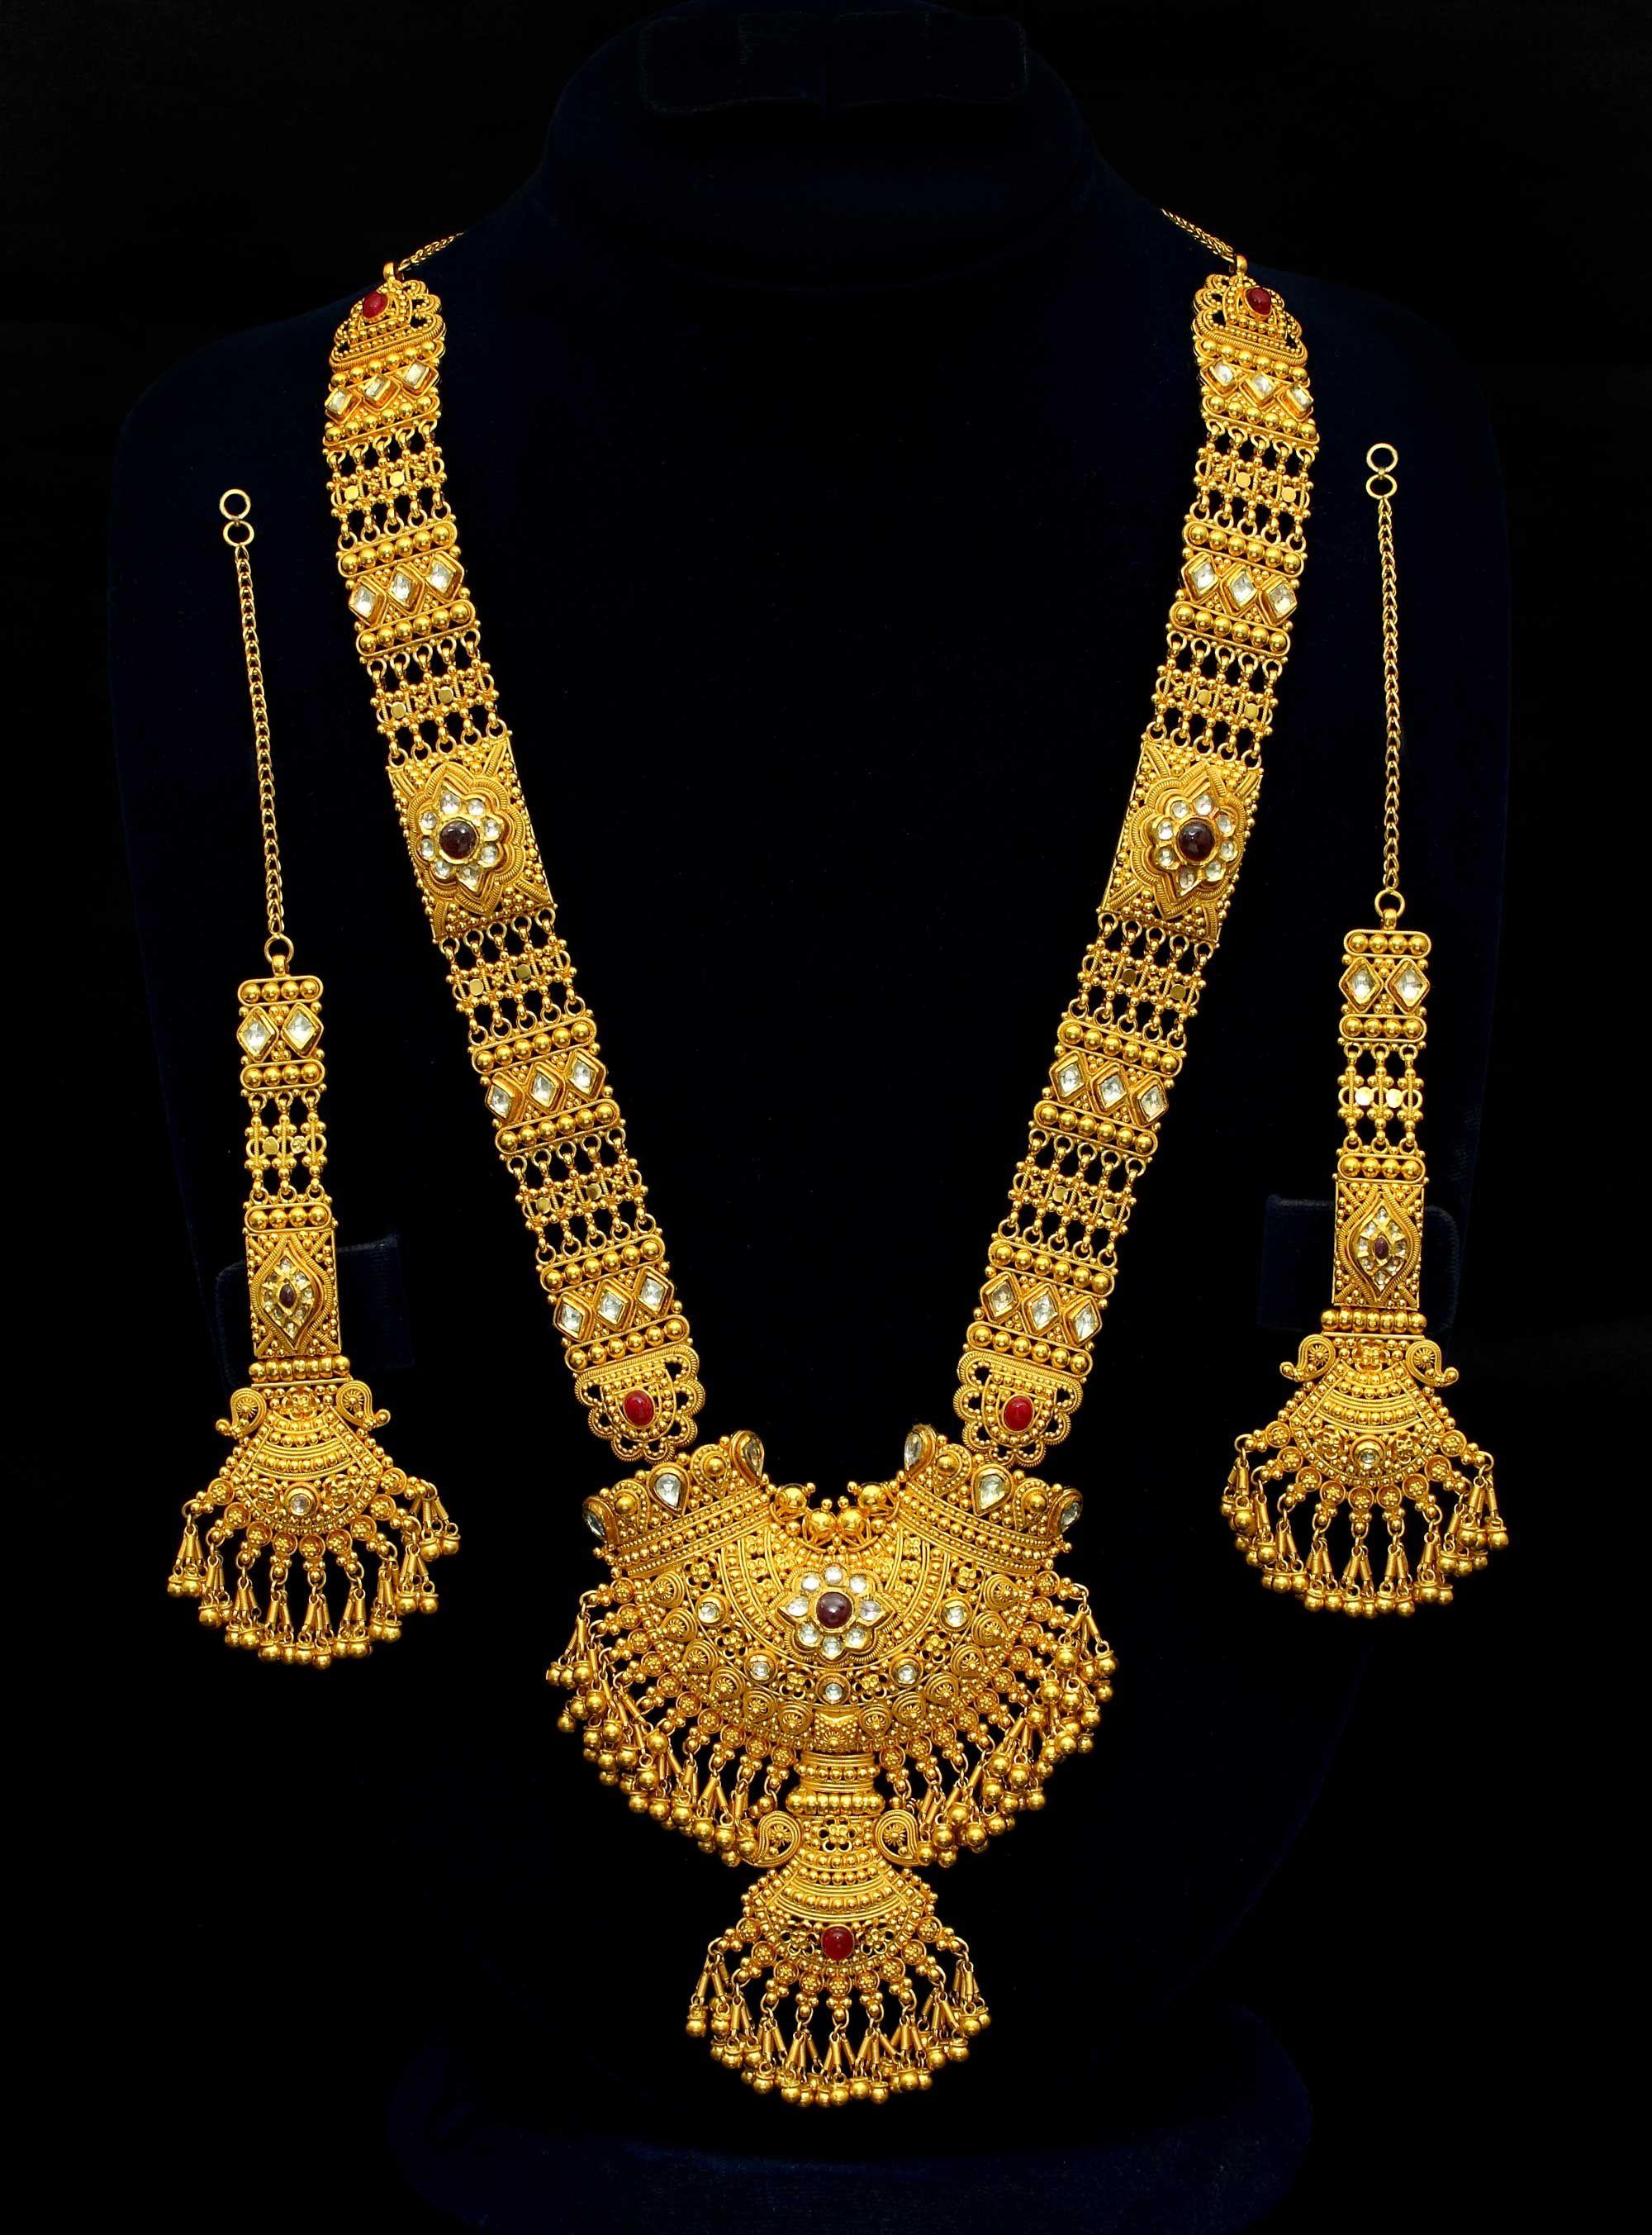 http://www.vummidi.com/images/collection/gold/necklace/landing-vbj ...